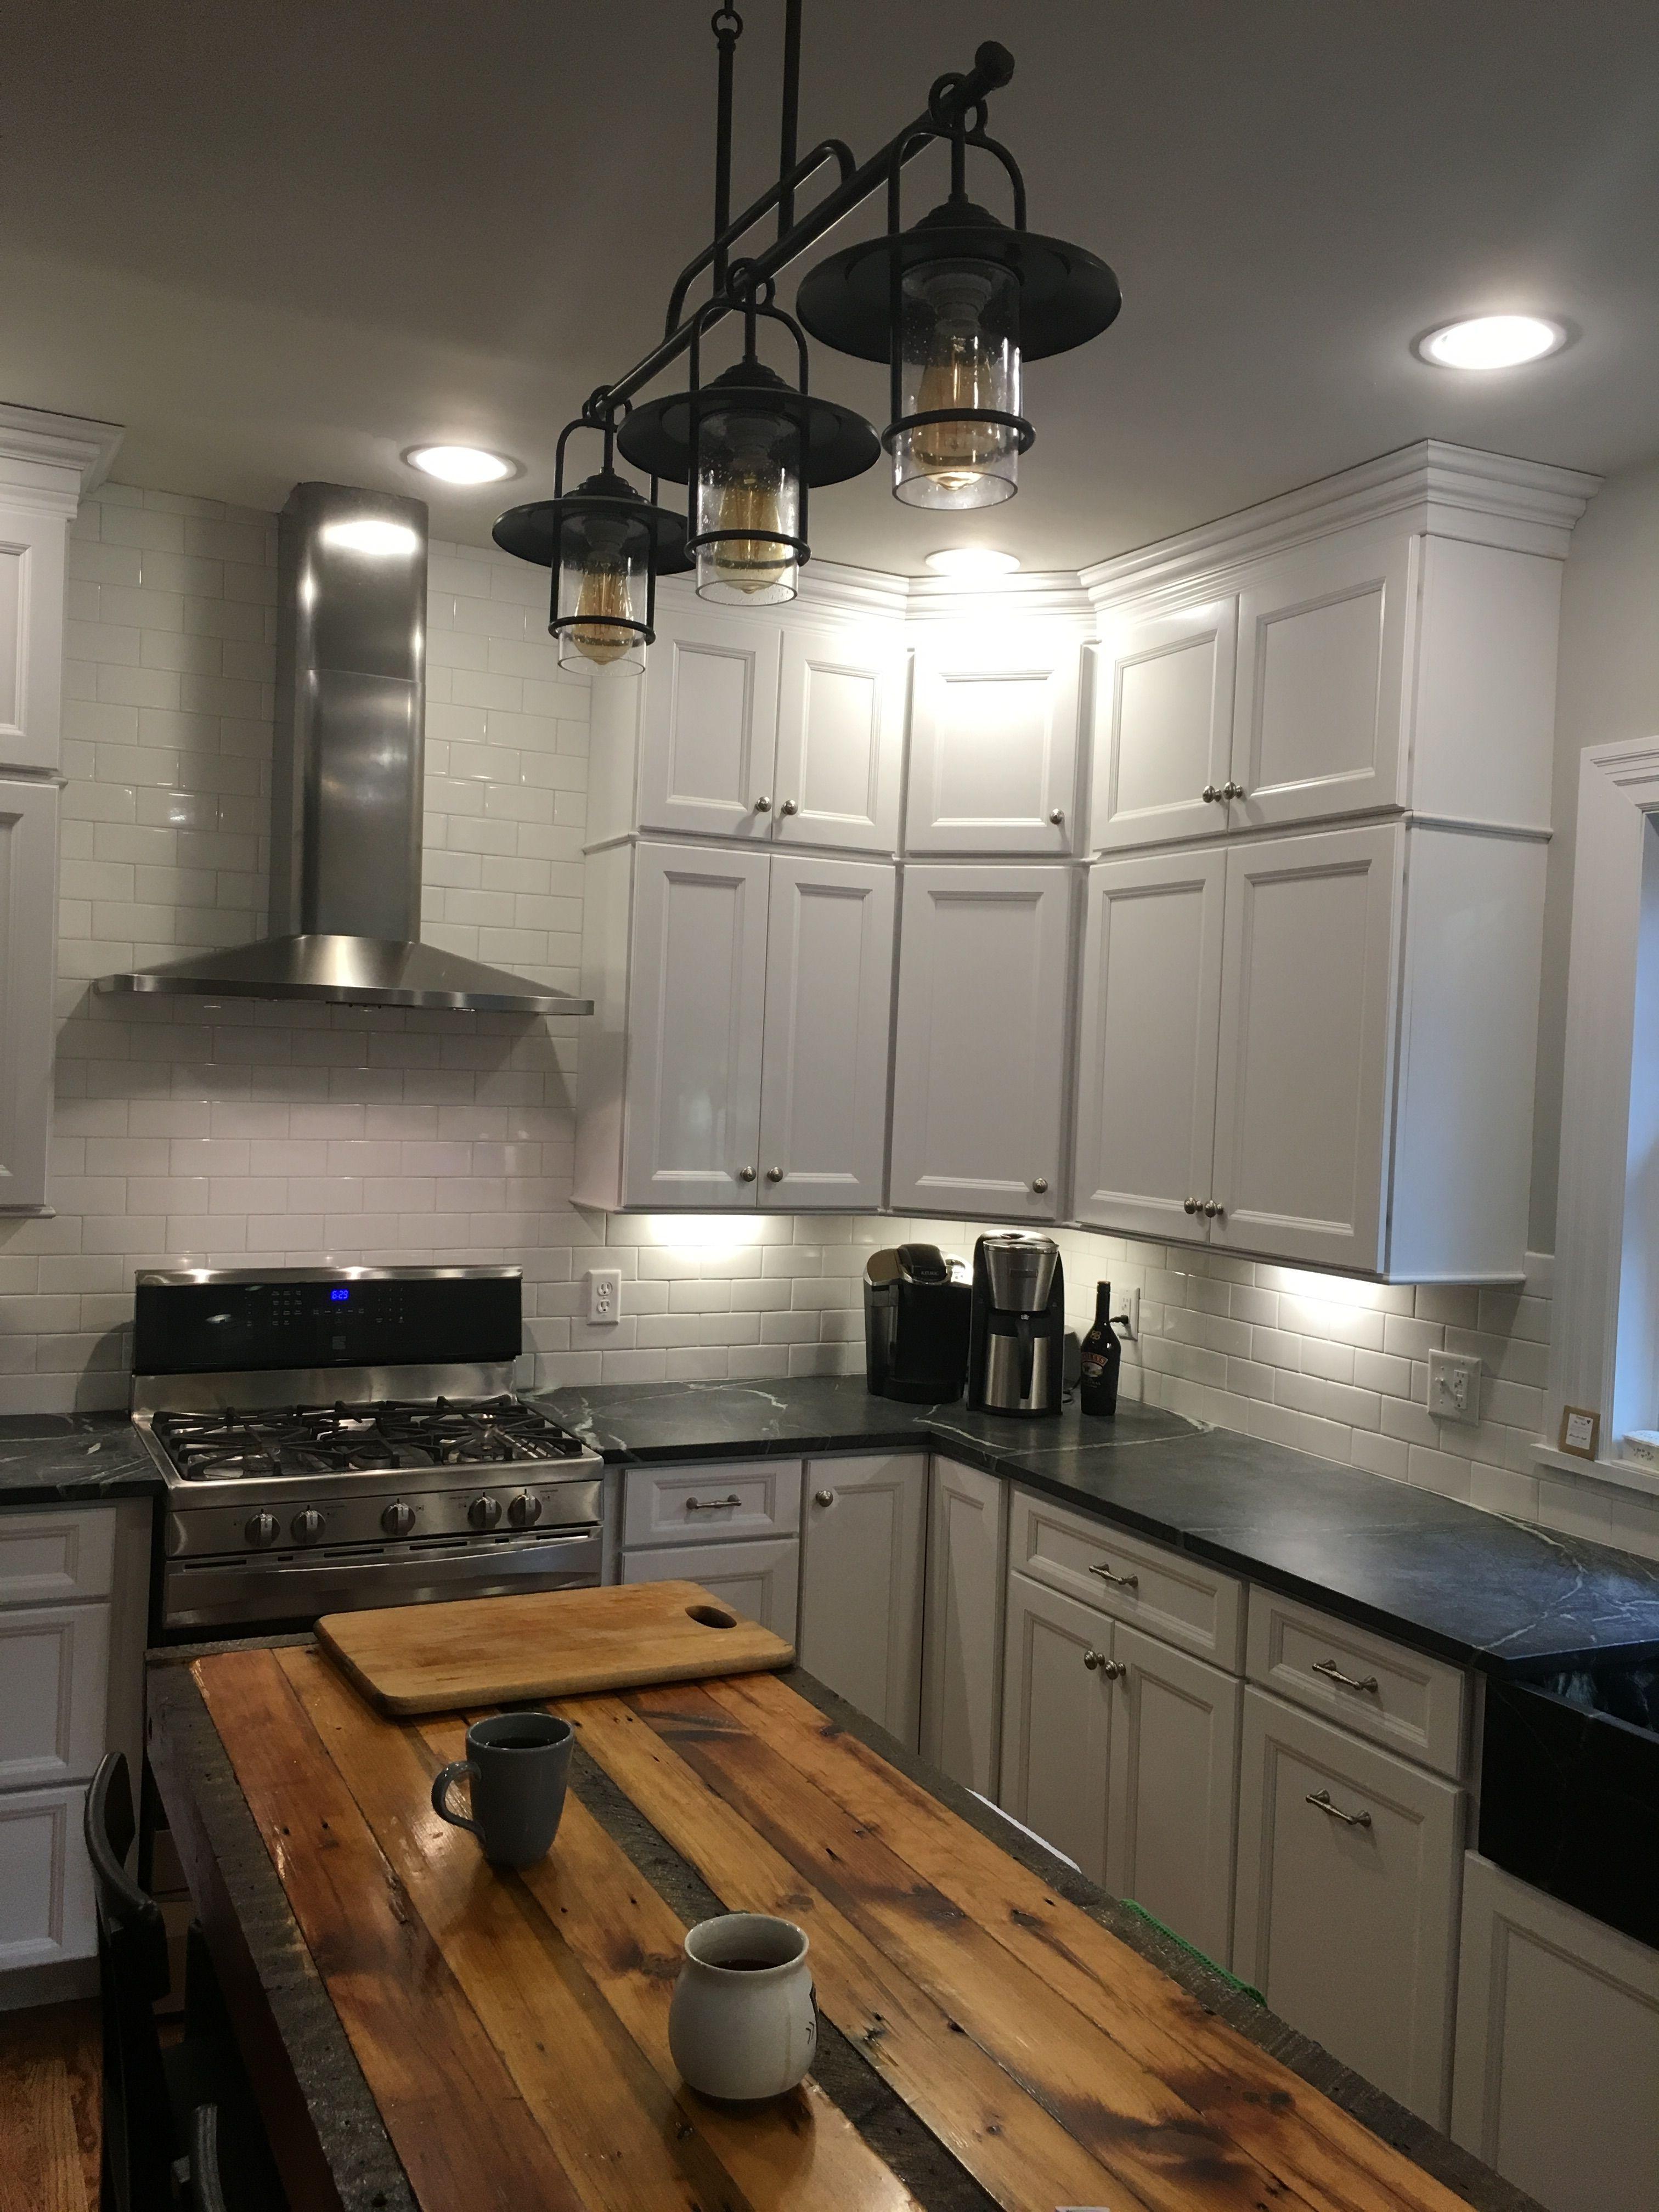 Kabinart cabinets with soapstone countertops | Soapstone ...